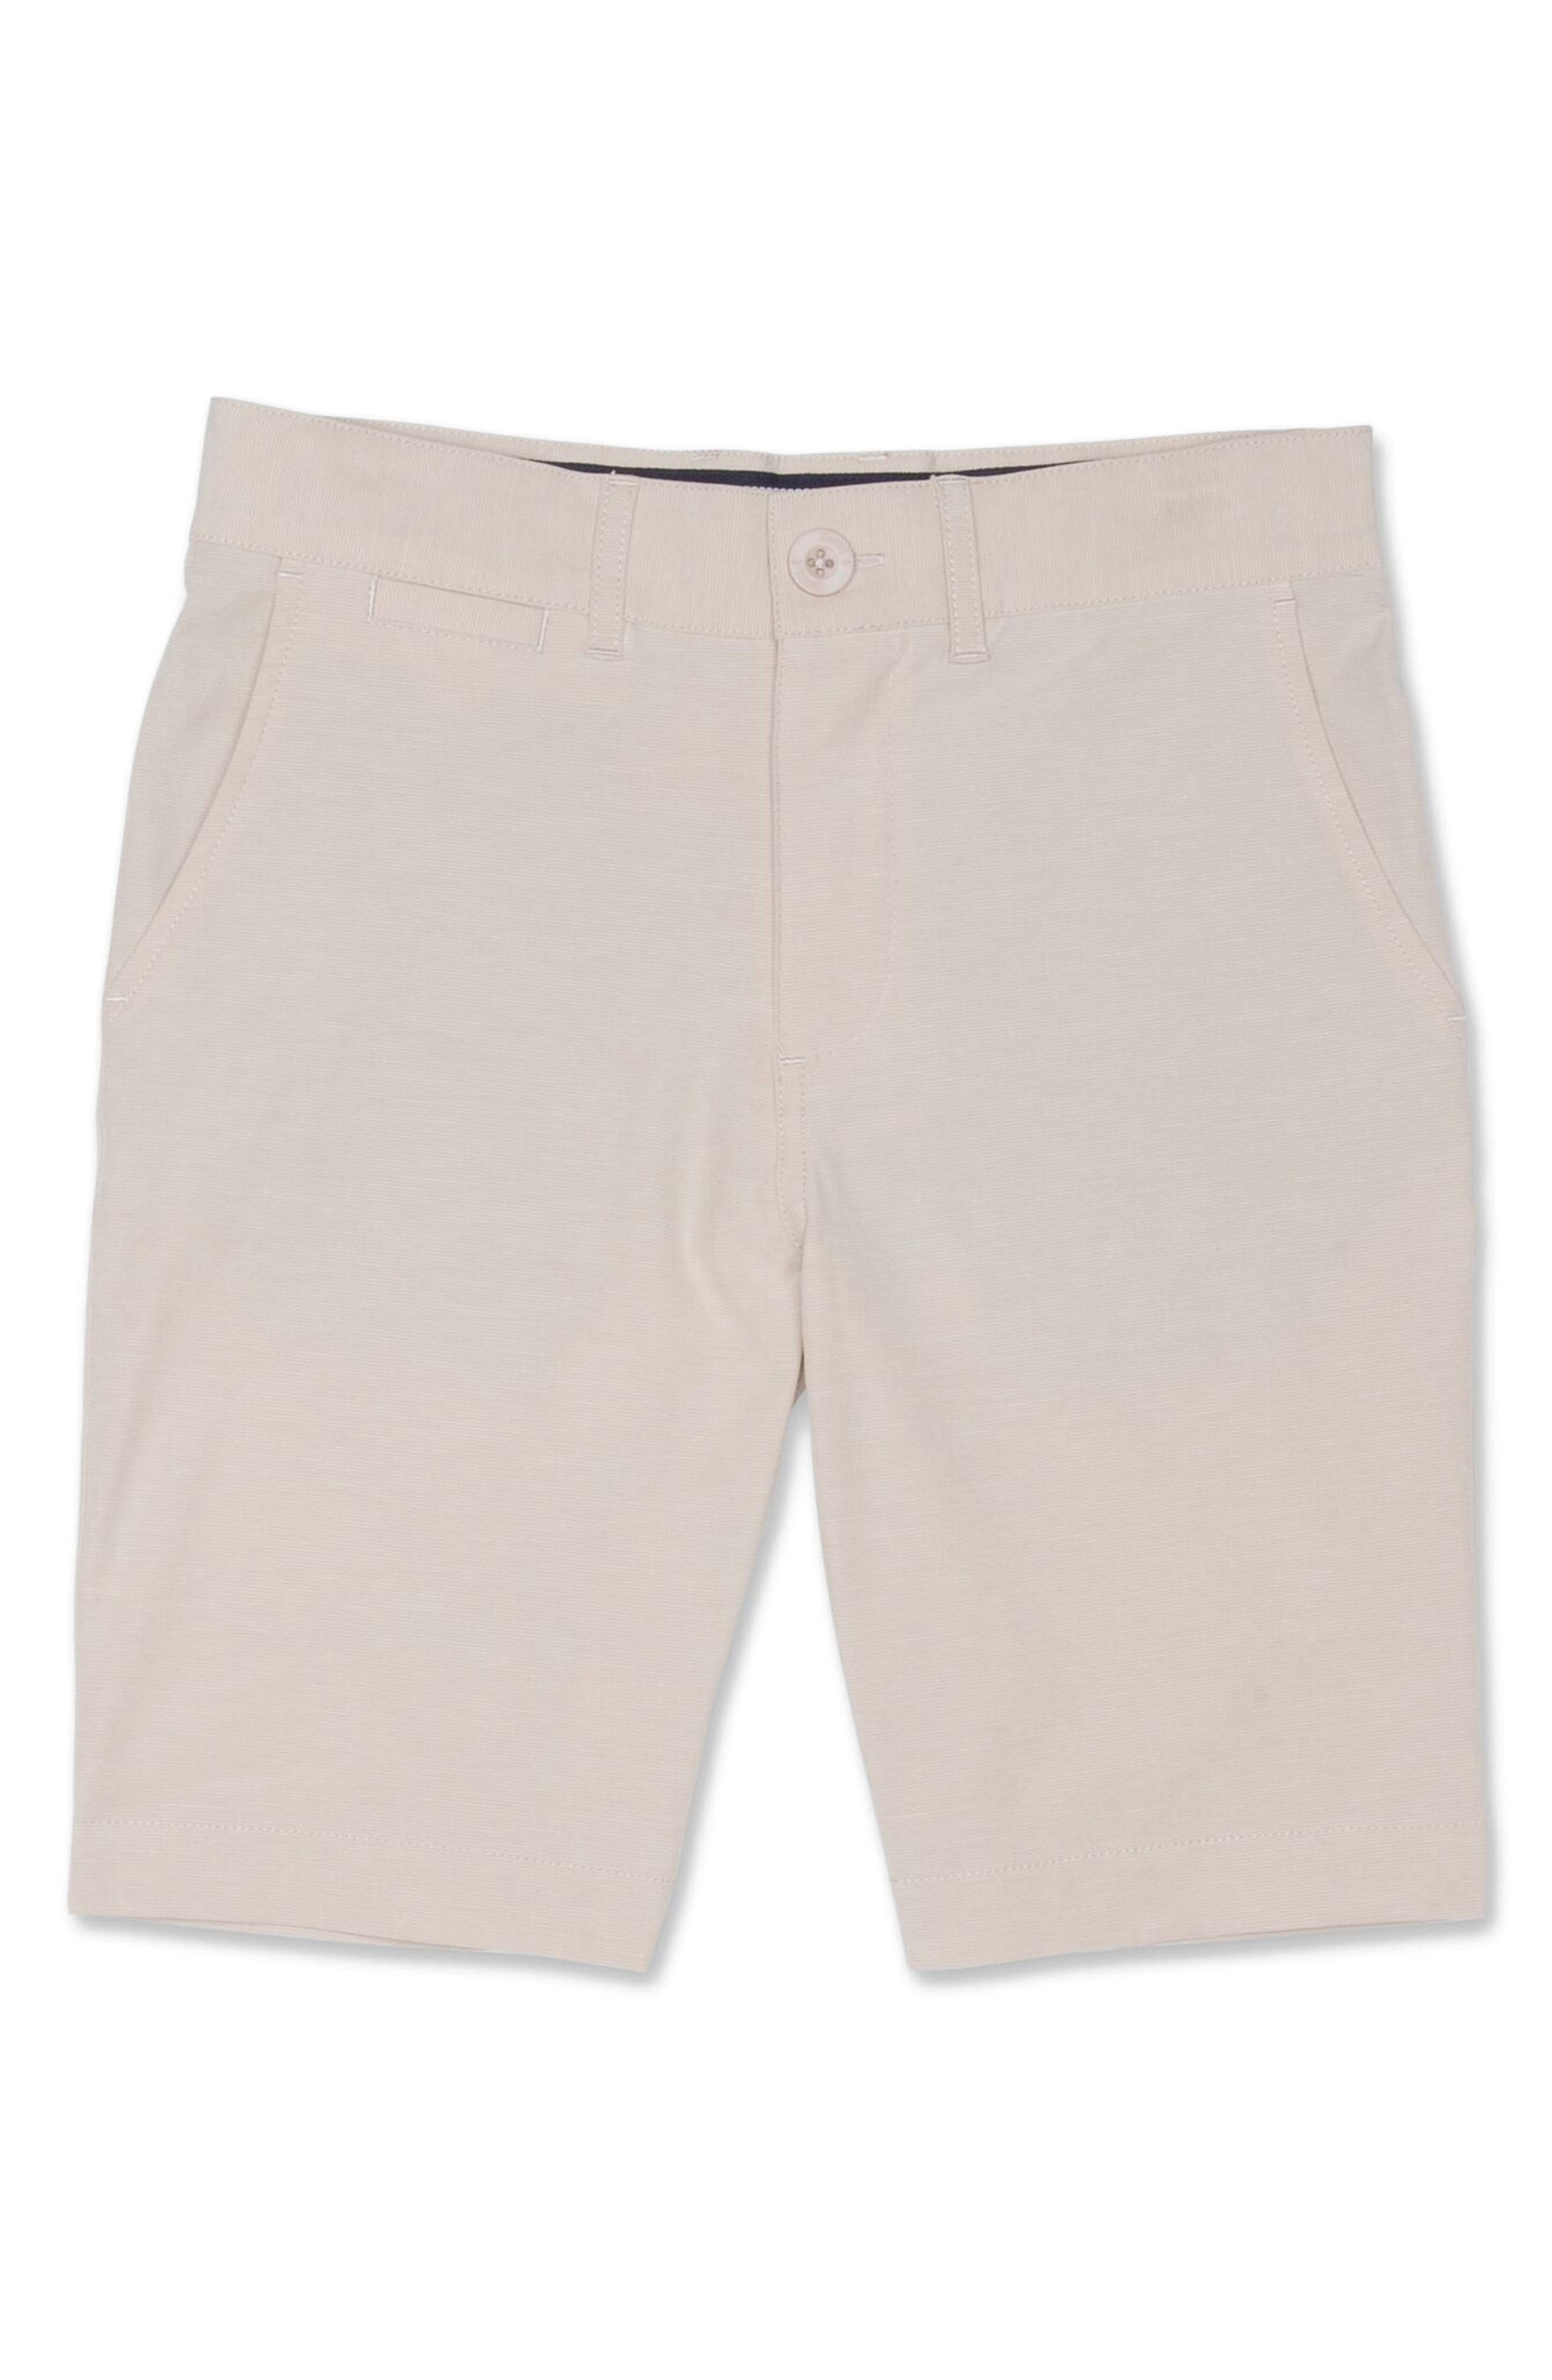 Wyatt Shorts,                             Main thumbnail 1, color,                             STONE